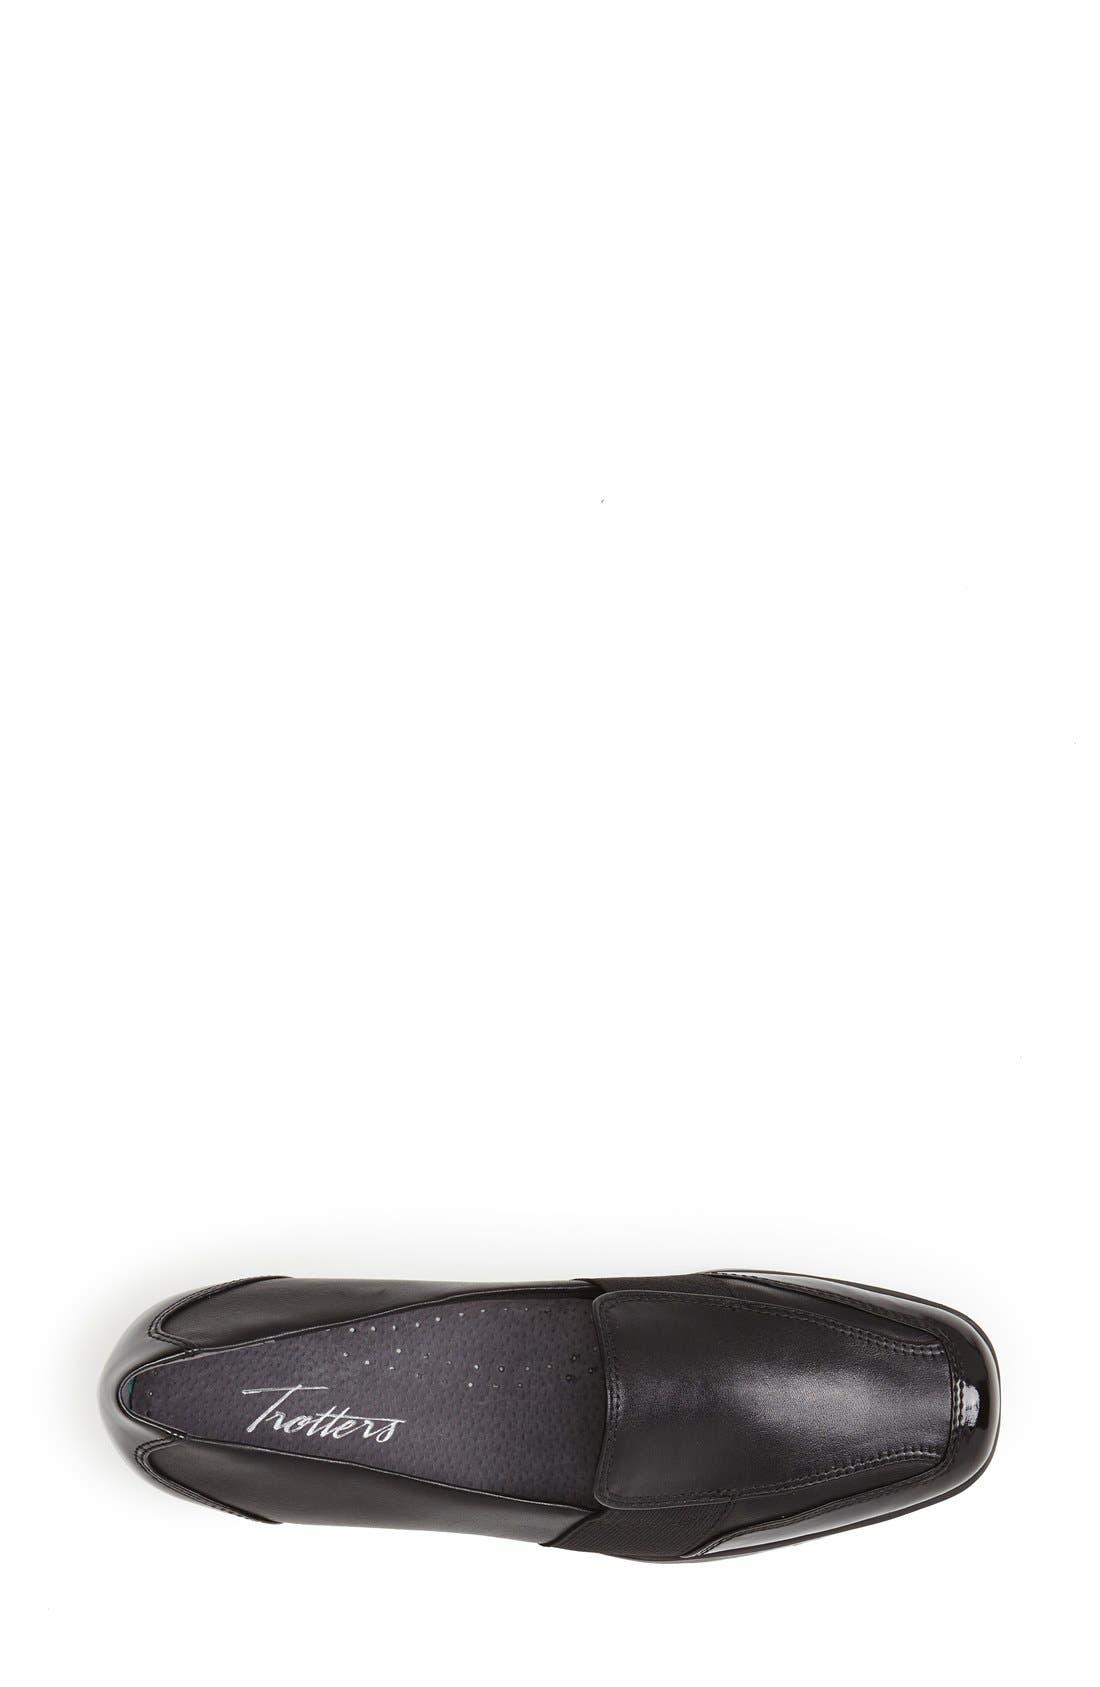 'Arianna' Loafer,                             Alternate thumbnail 3, color,                             Black